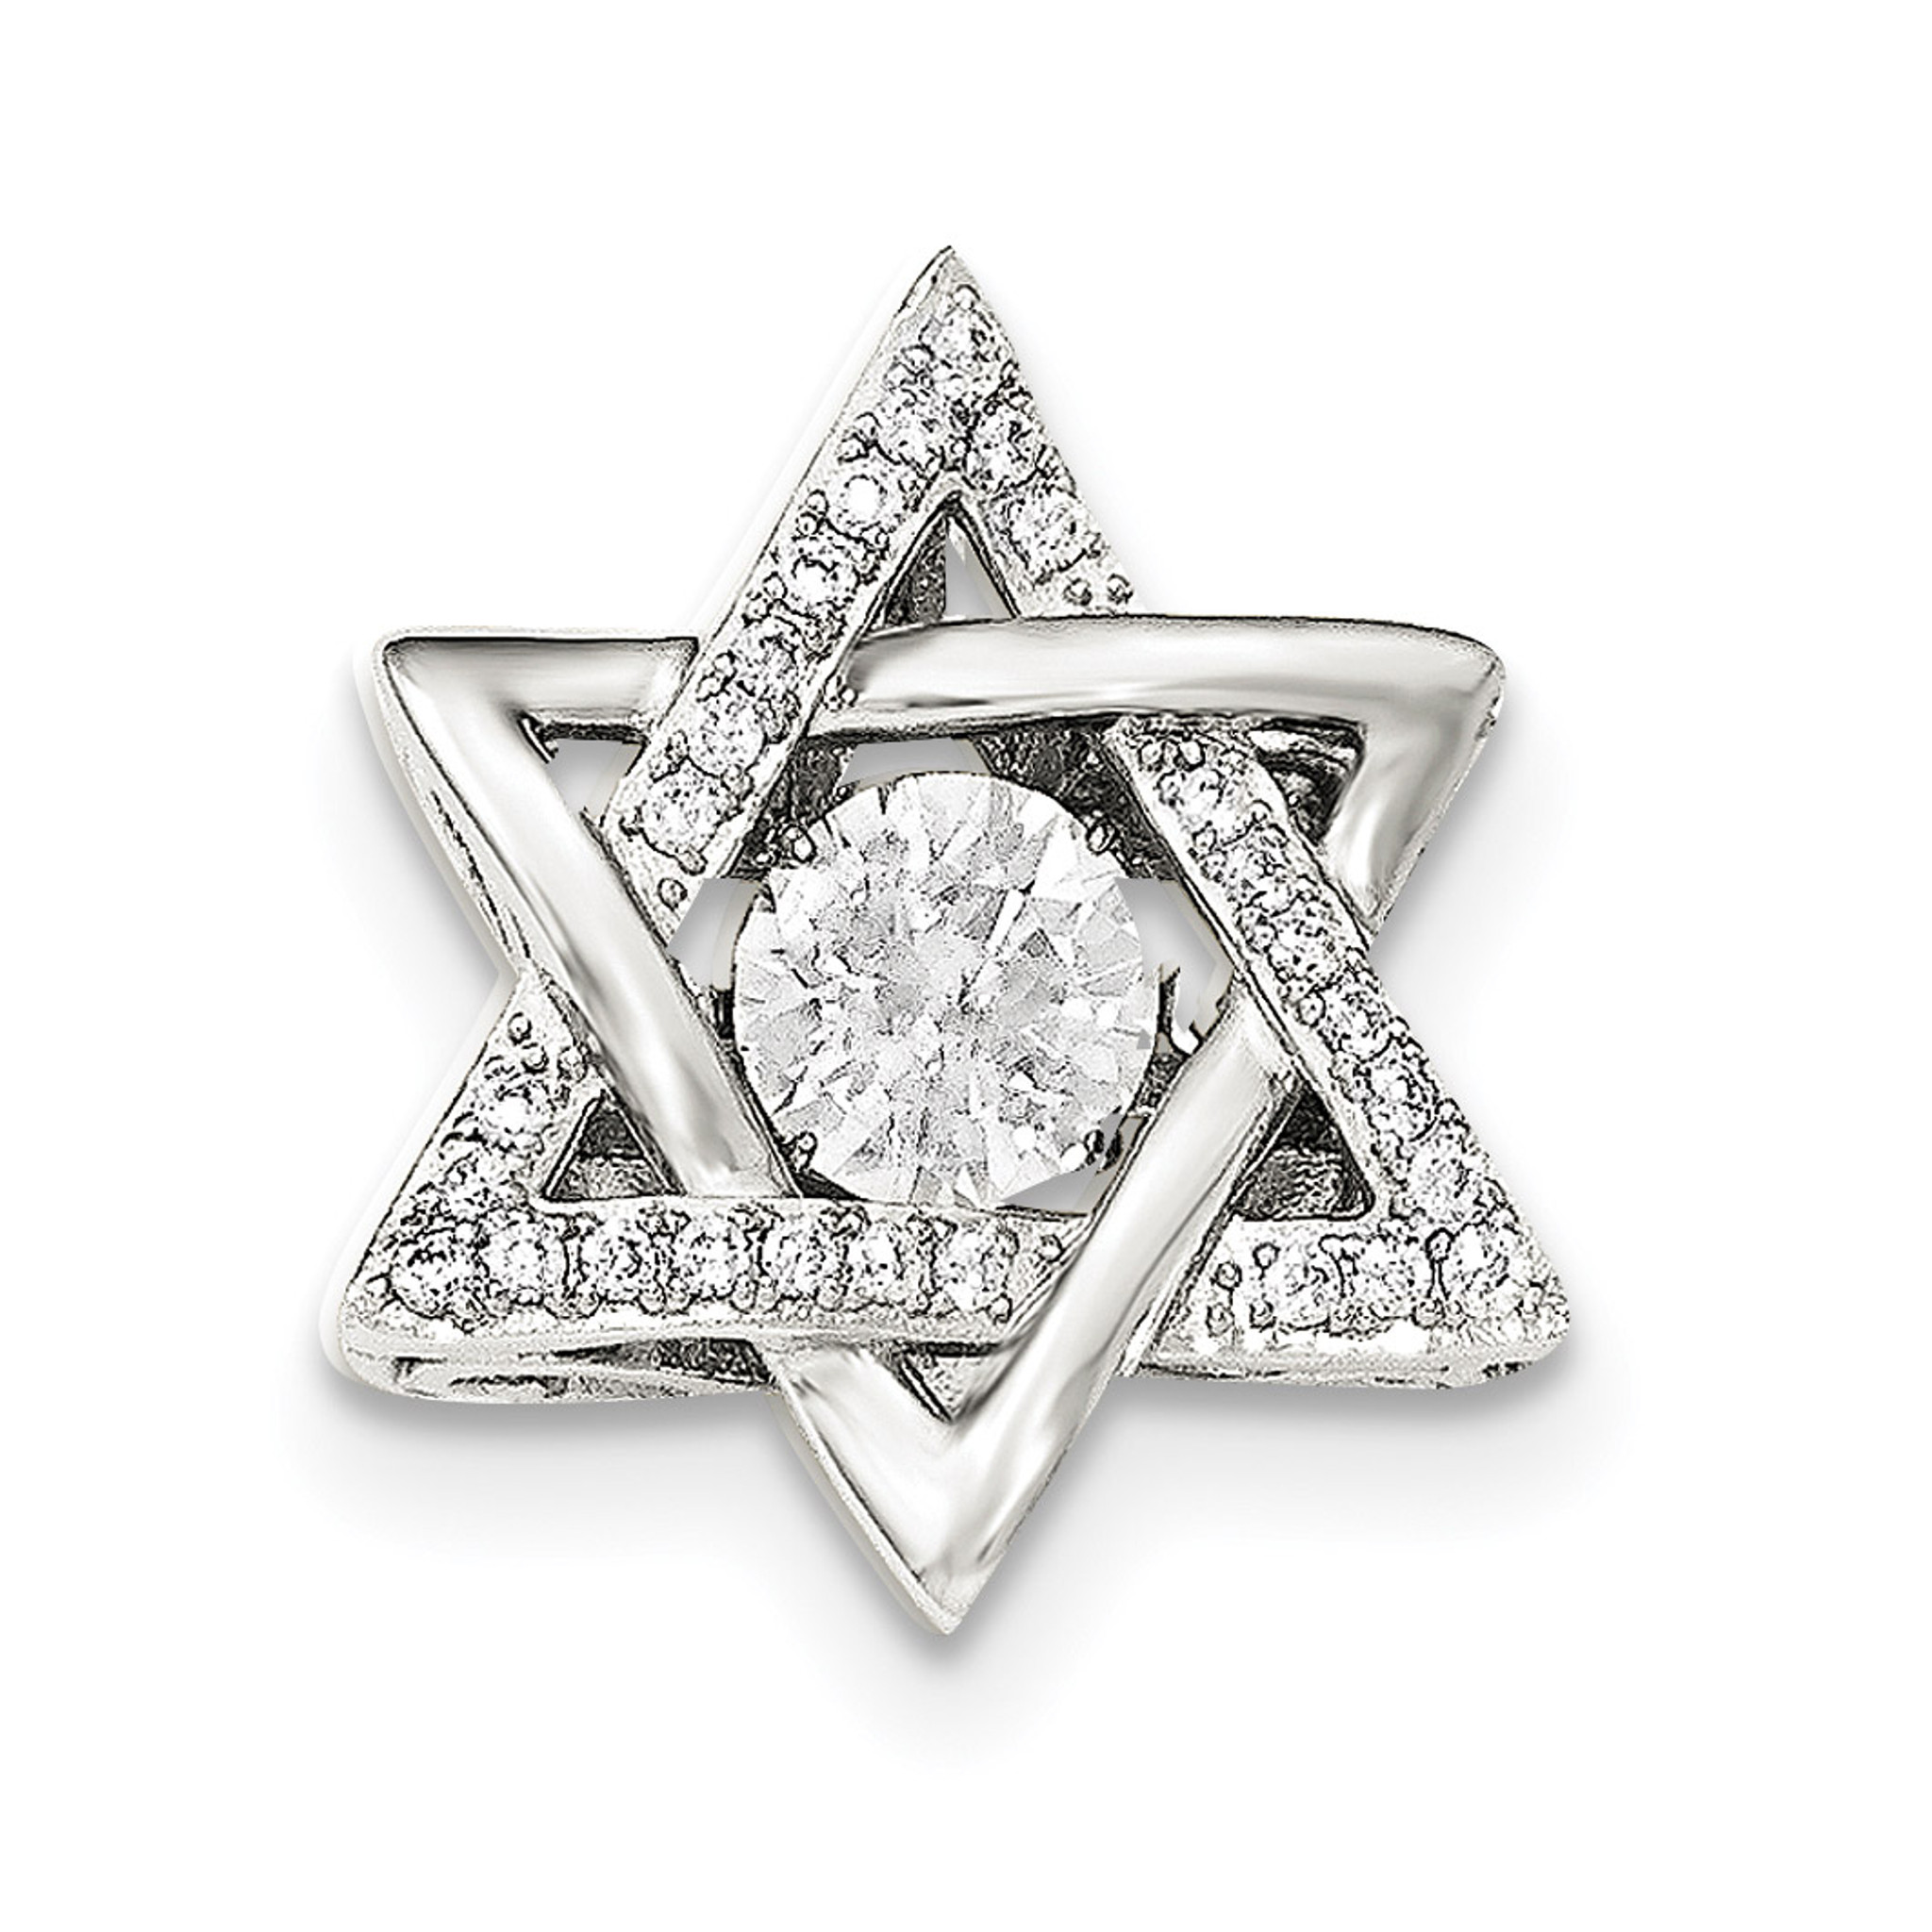 925 Sterling Silver Platinum Plated Vibrant Swar Zircon Pendant